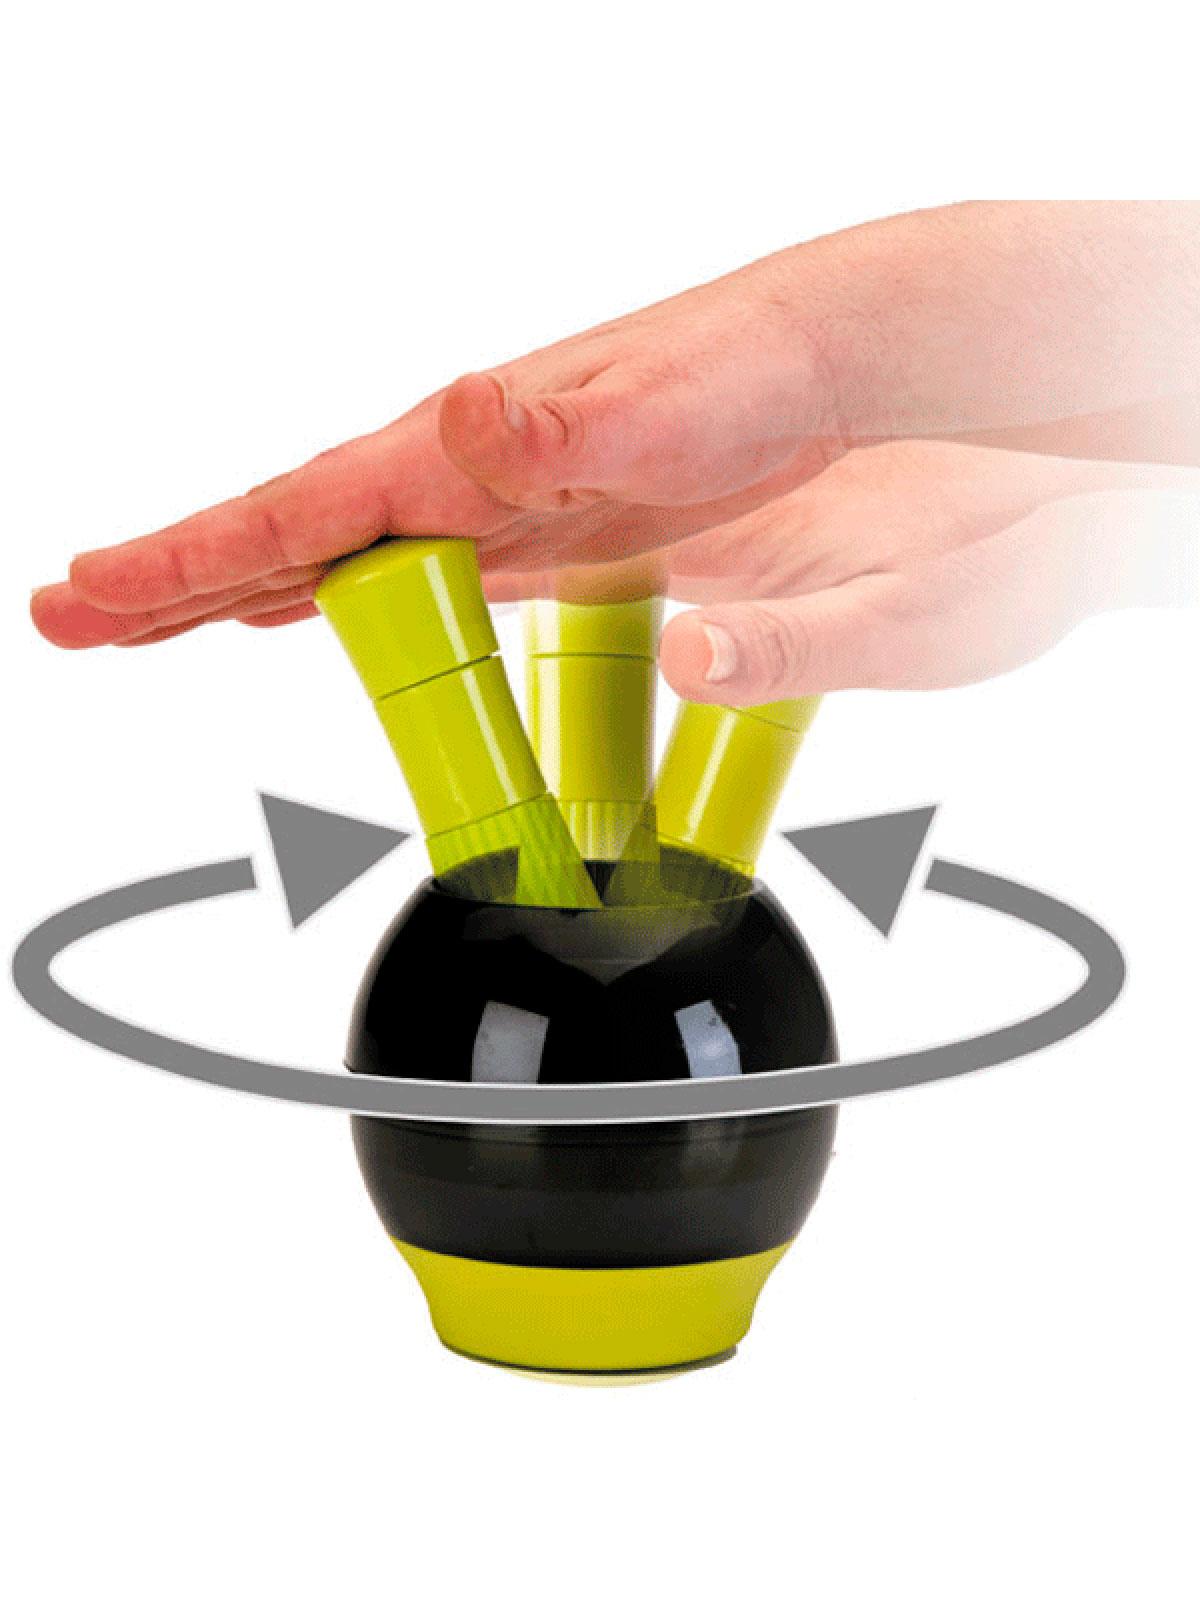 Ib786401 1 mortero tienda online menaje hogar utensilios for Menaje cocina online